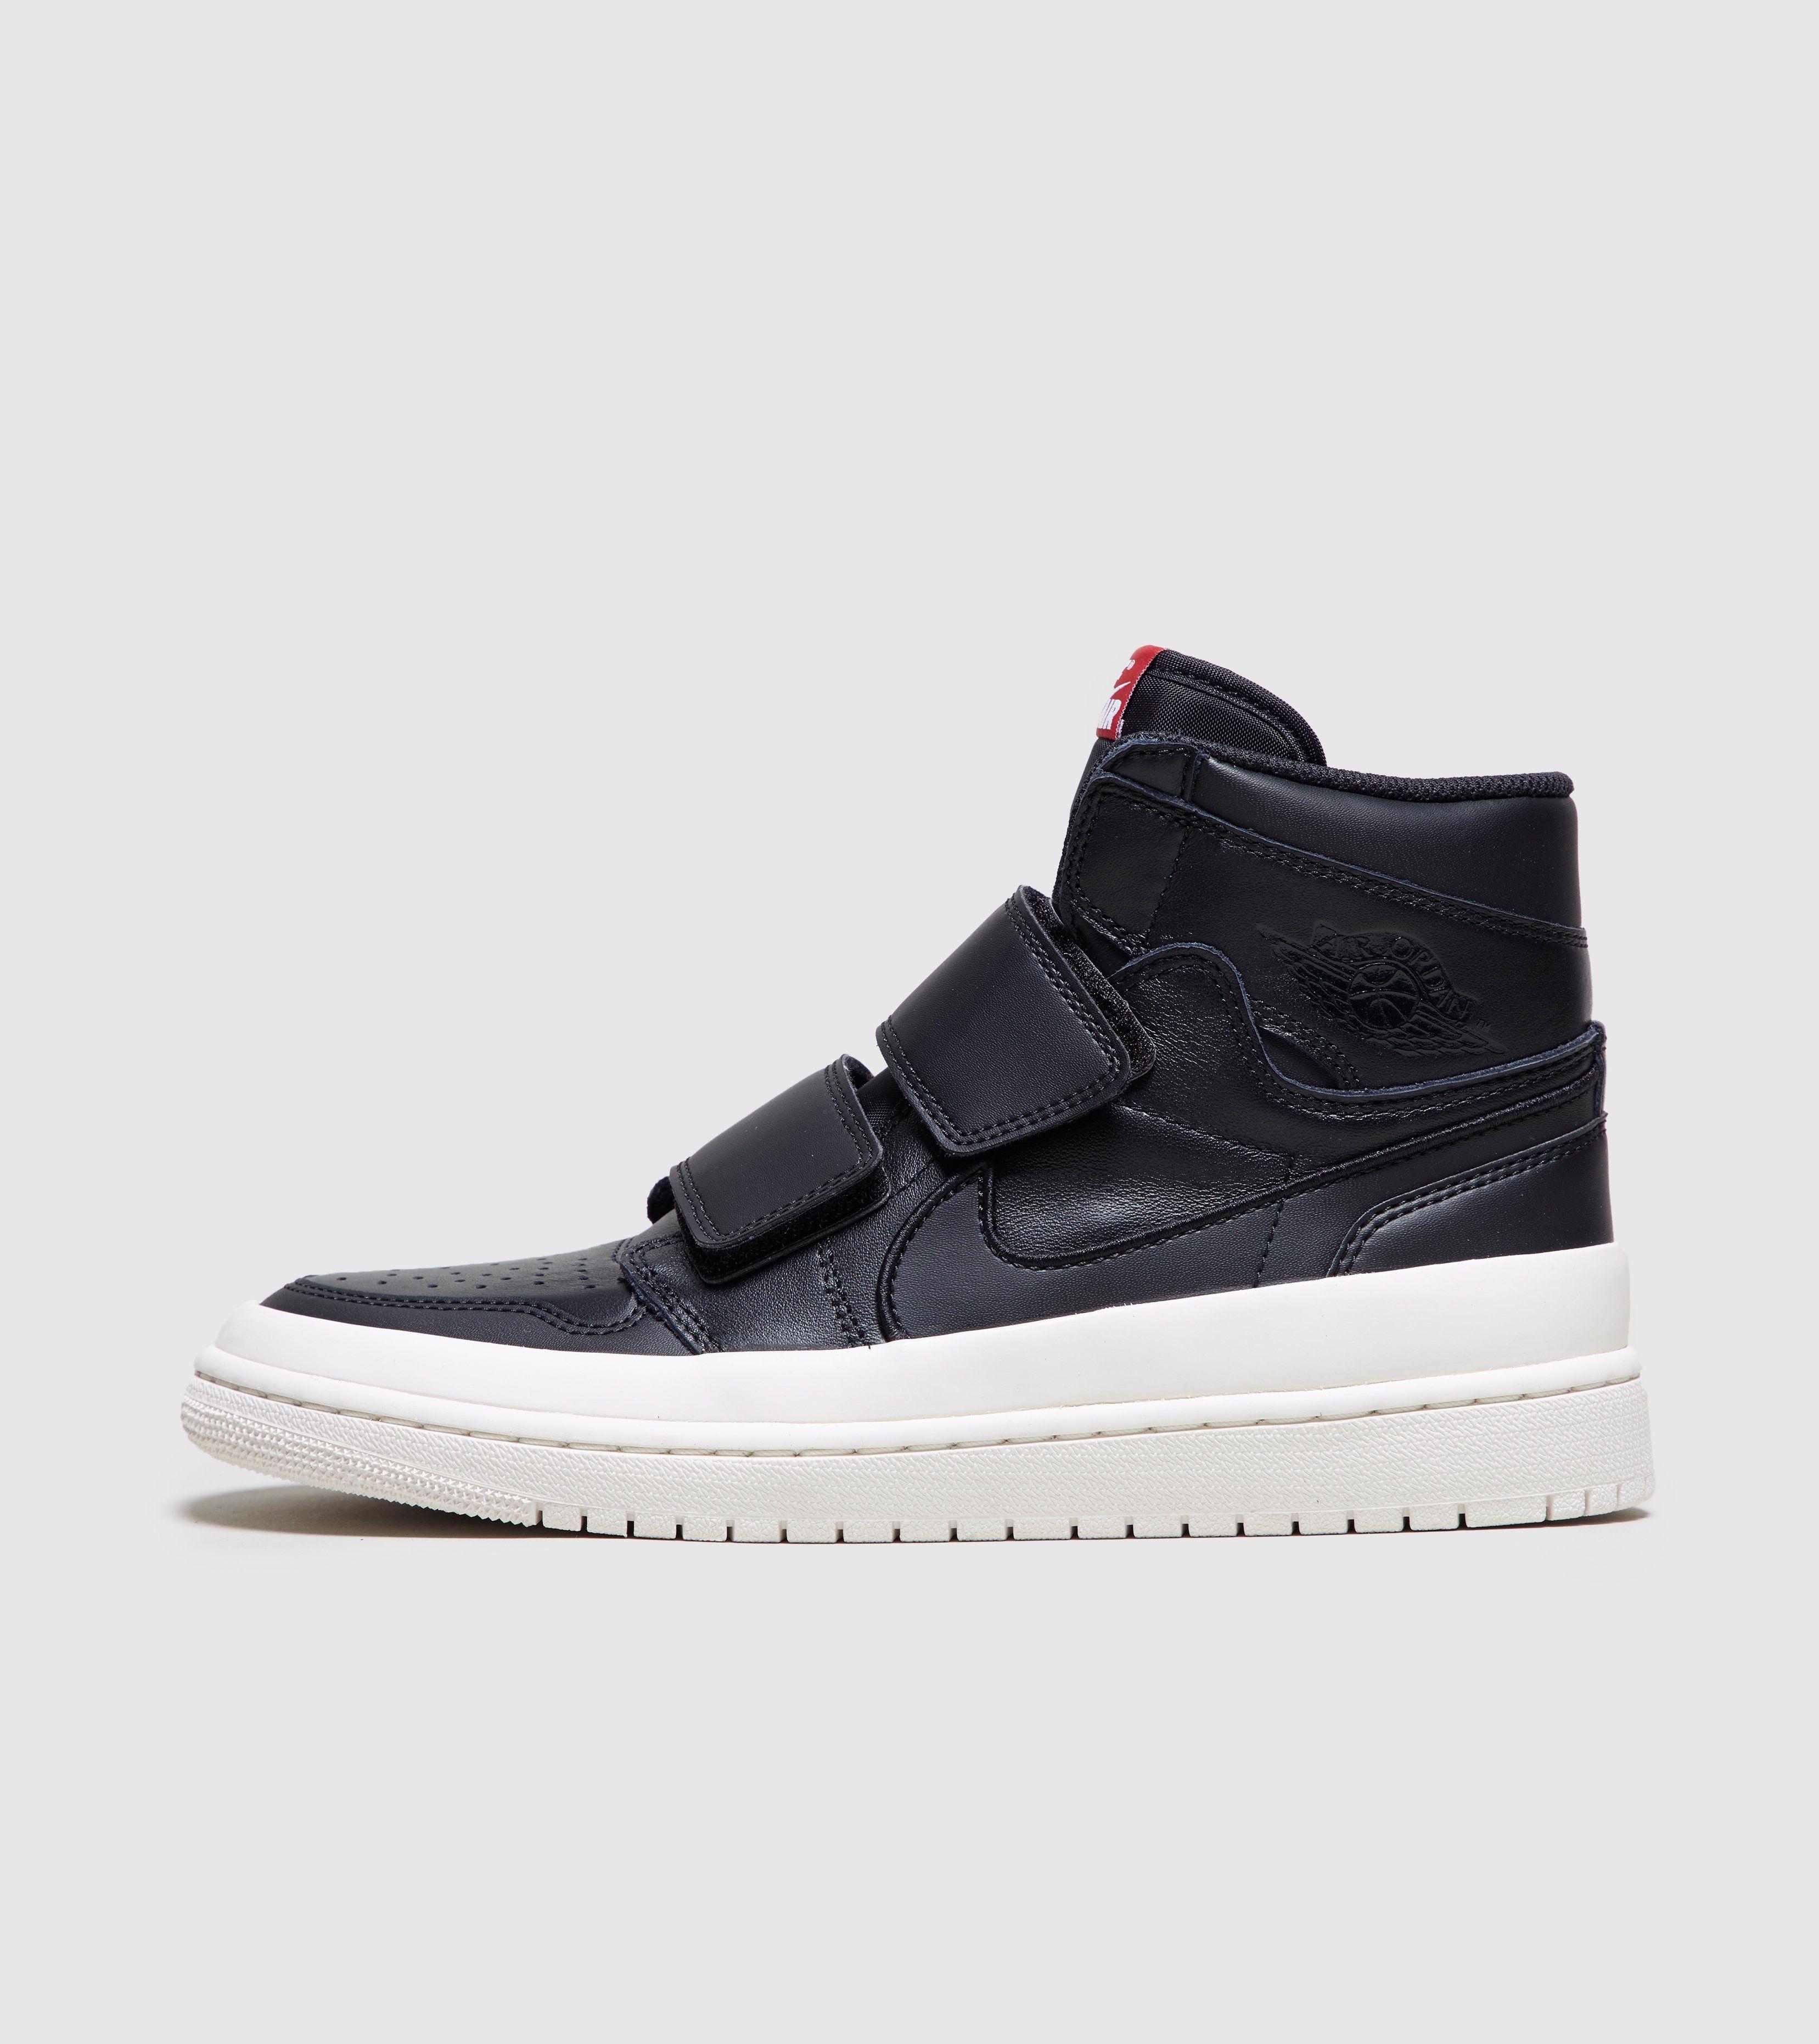 Nike Jordan 1 Hi Double Strap